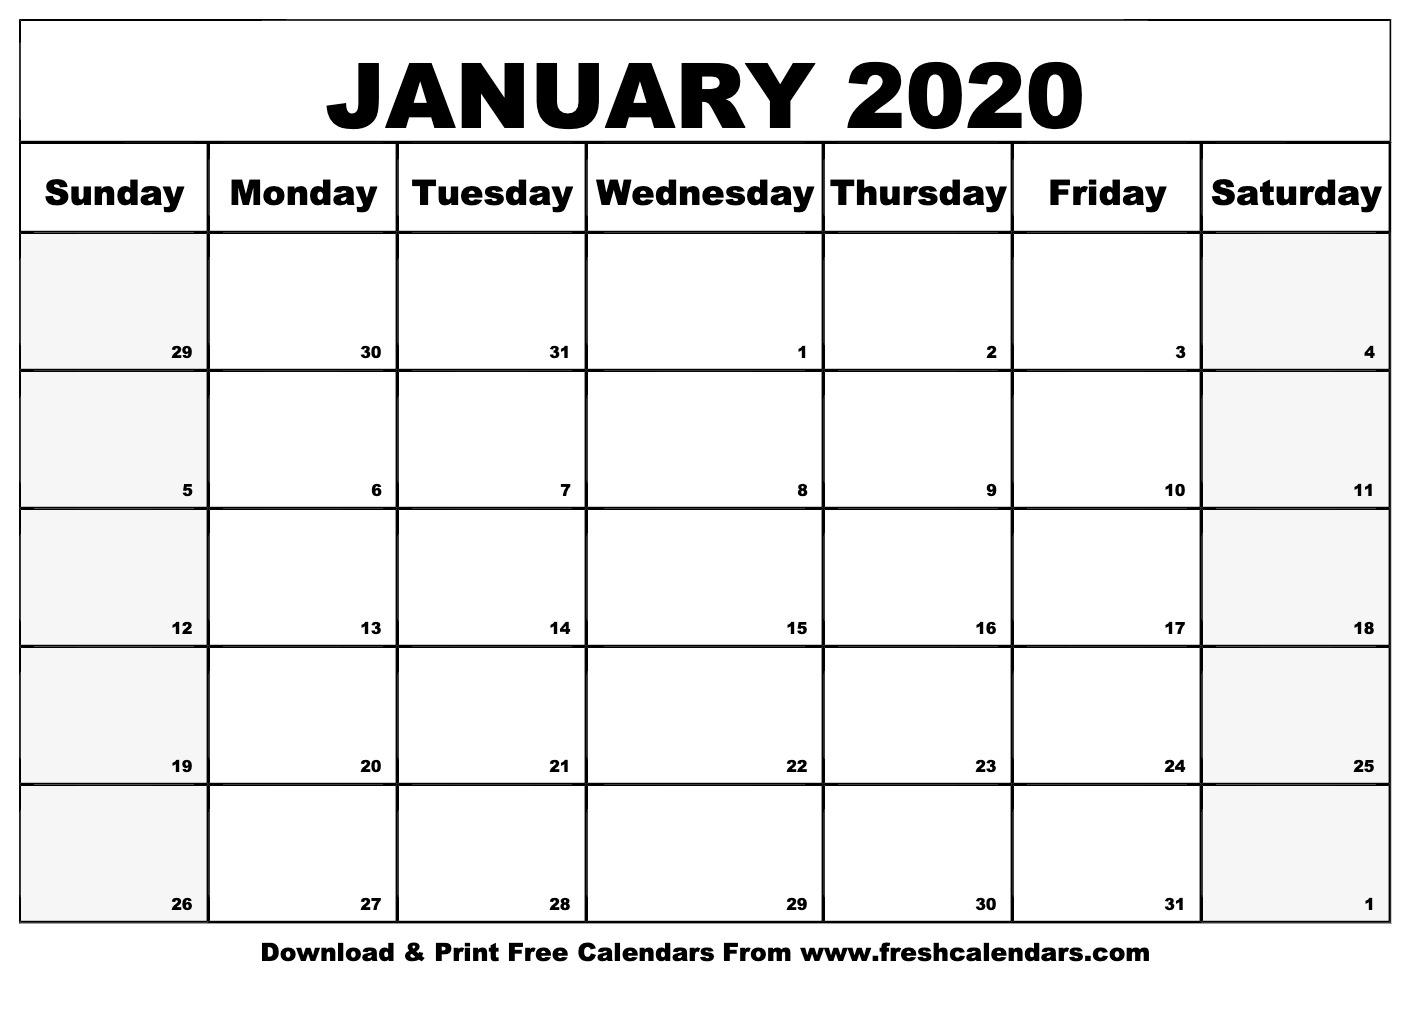 January 2020 Calendar Printable - Fresh Calendars